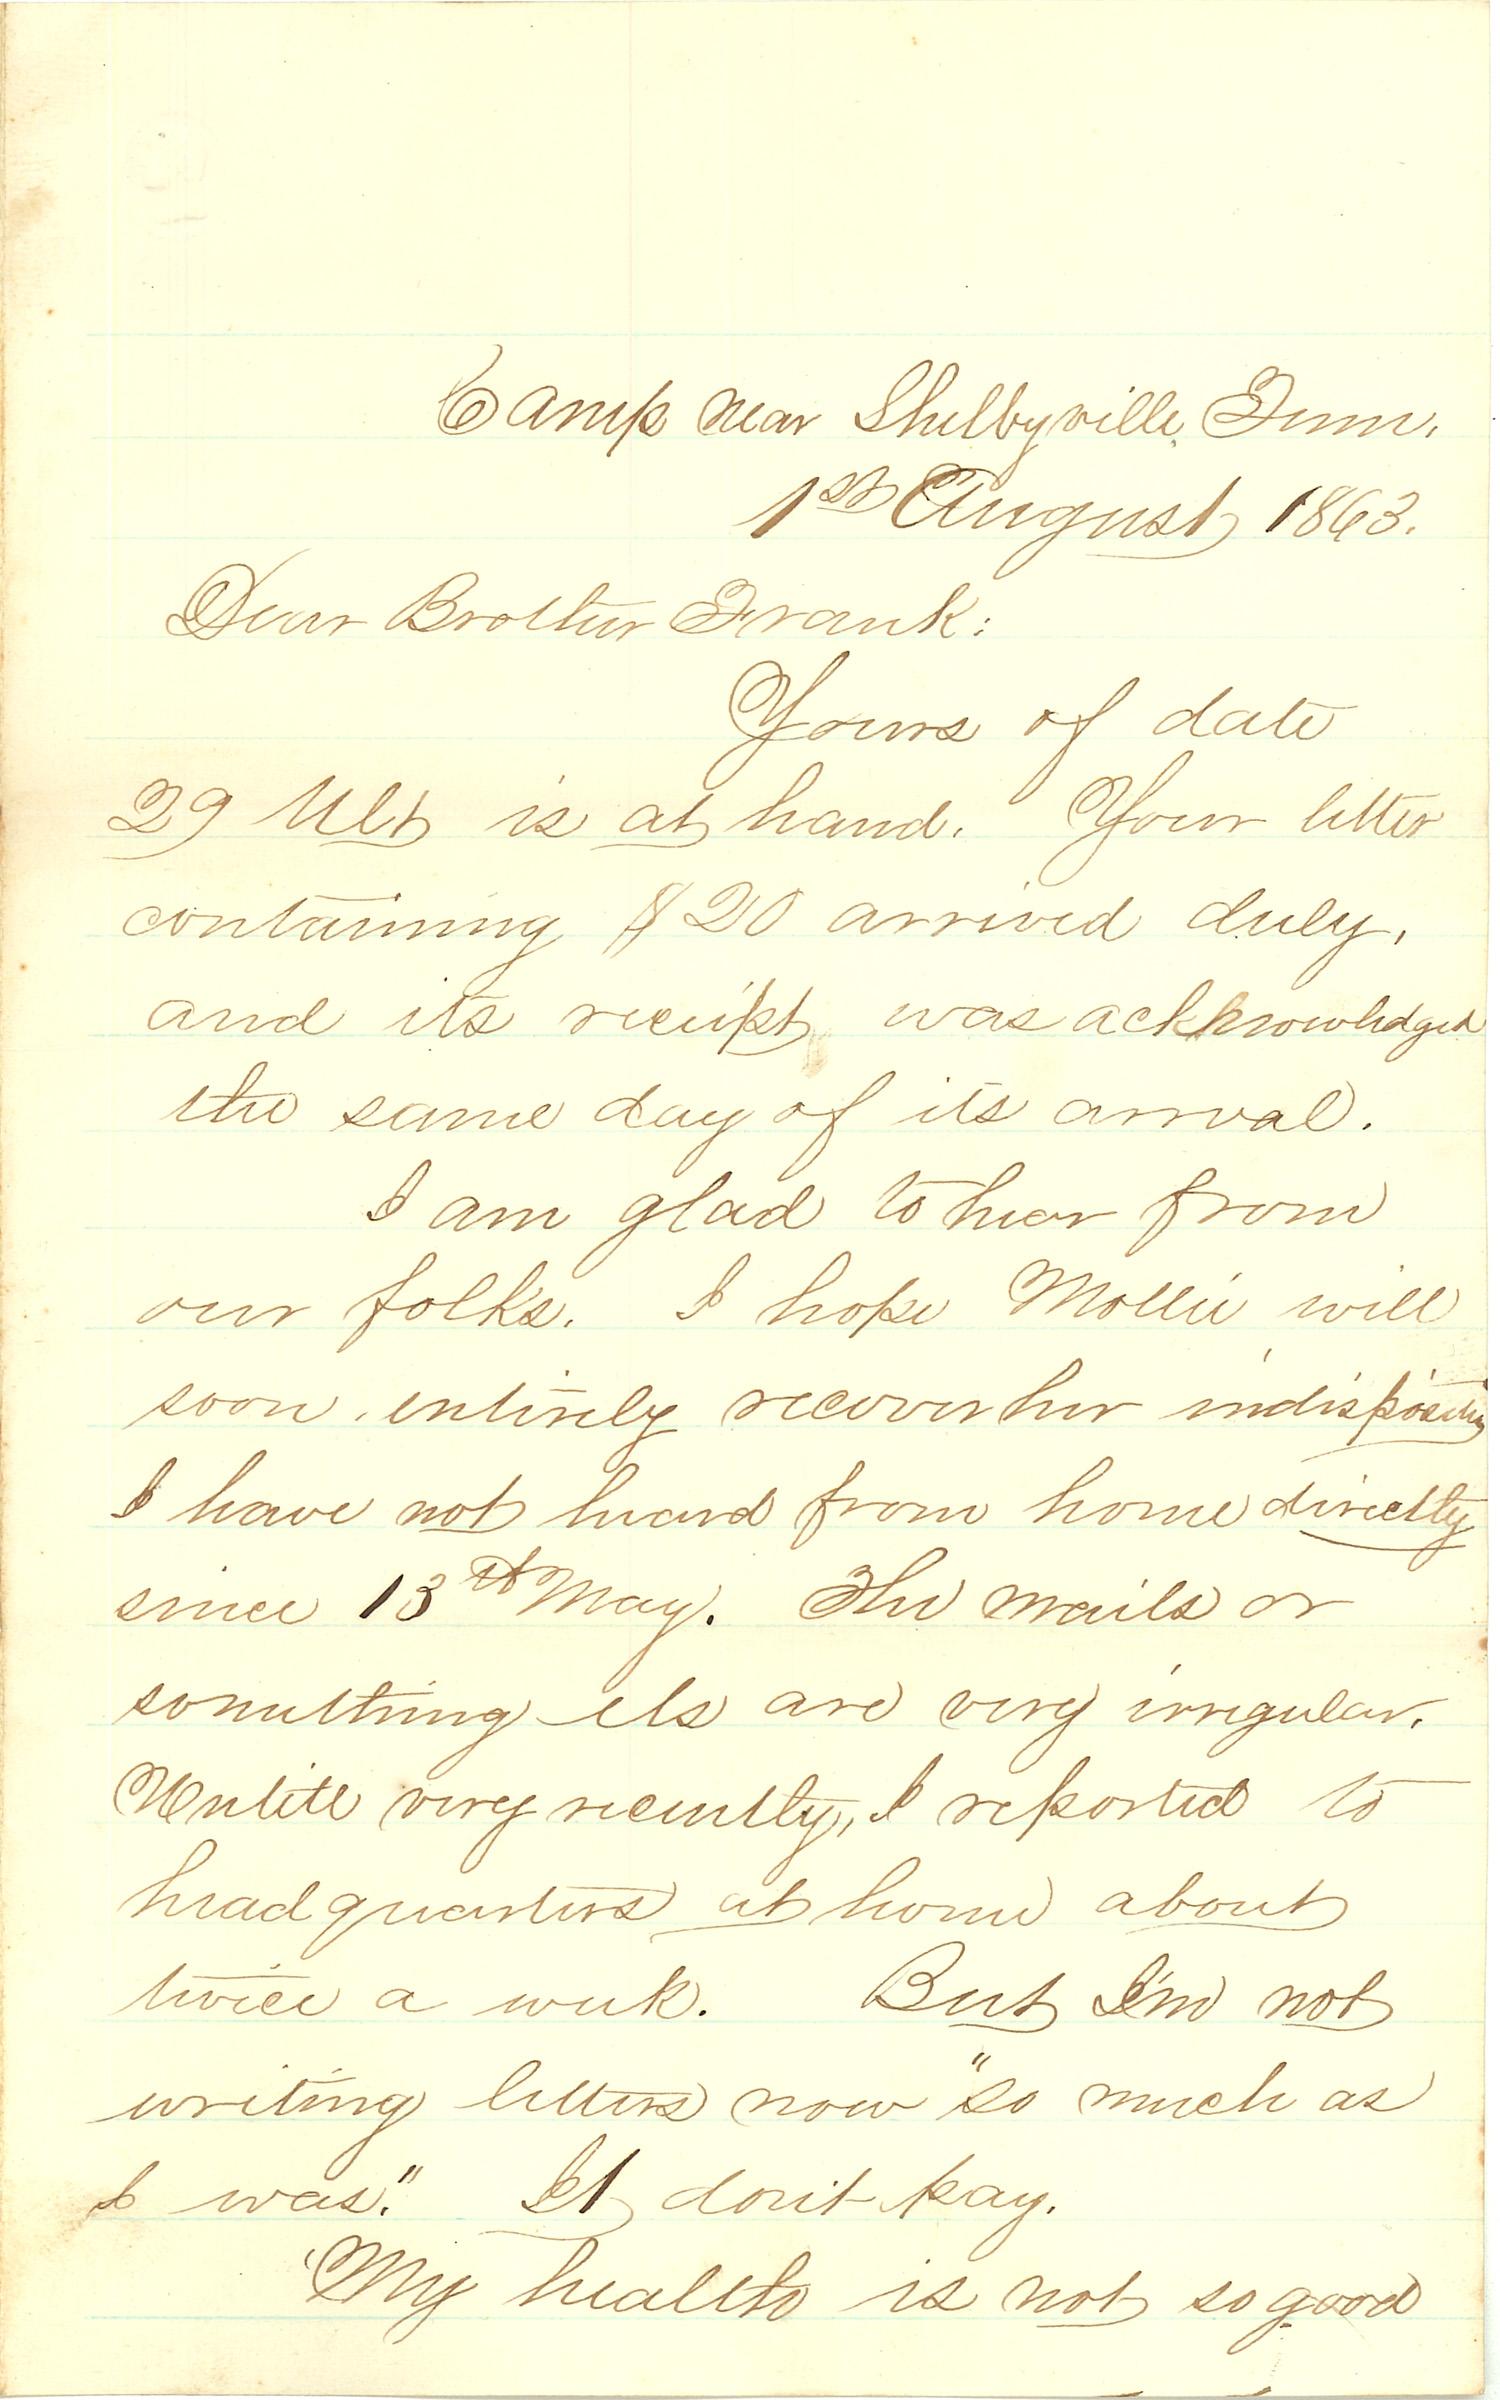 Joseph Culver Letter, August 1, 1863, Page 1